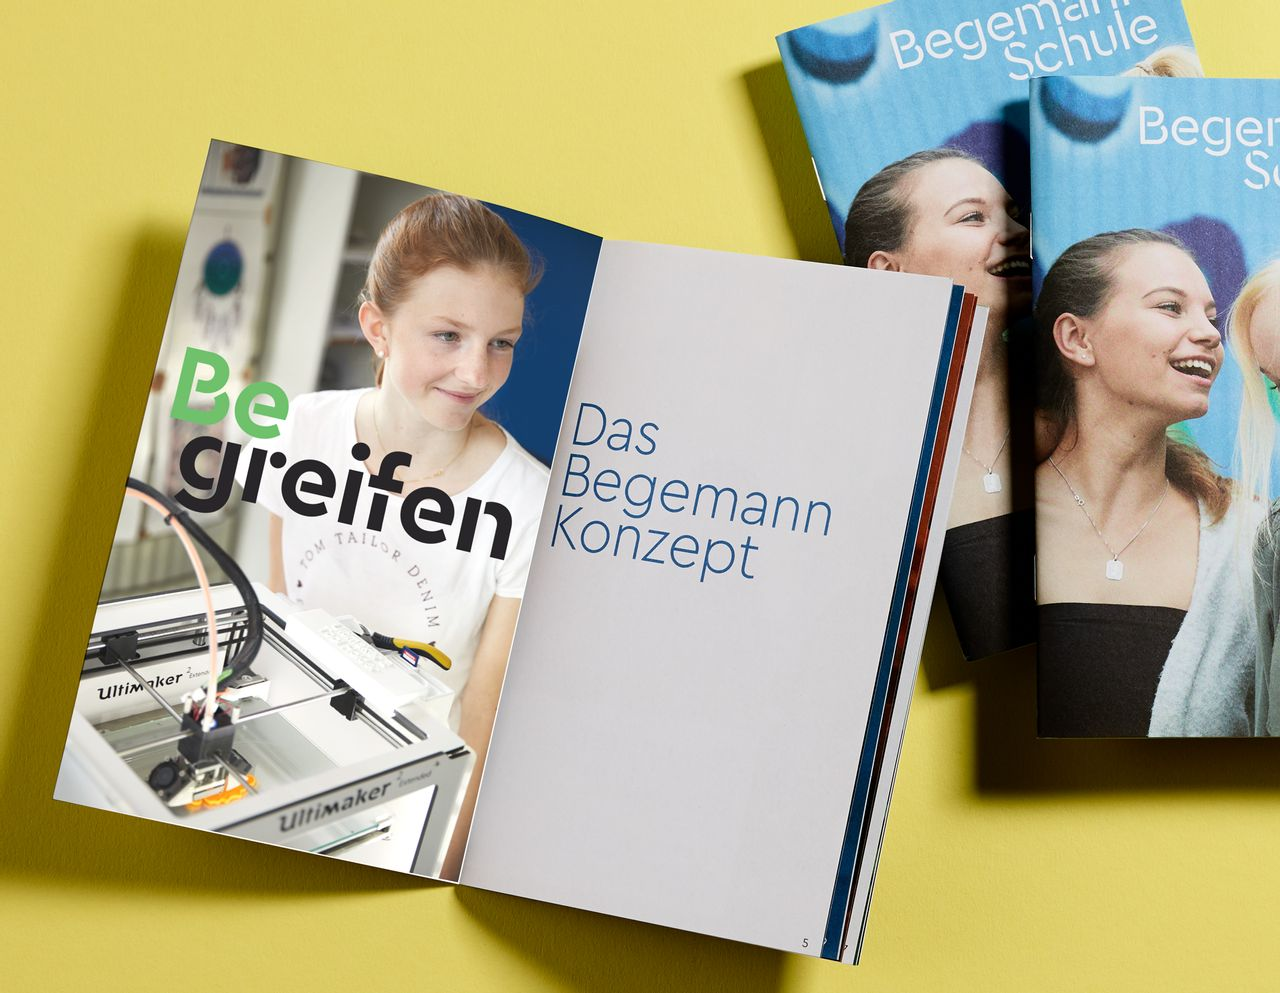 Begemann School, Studio Umlaut